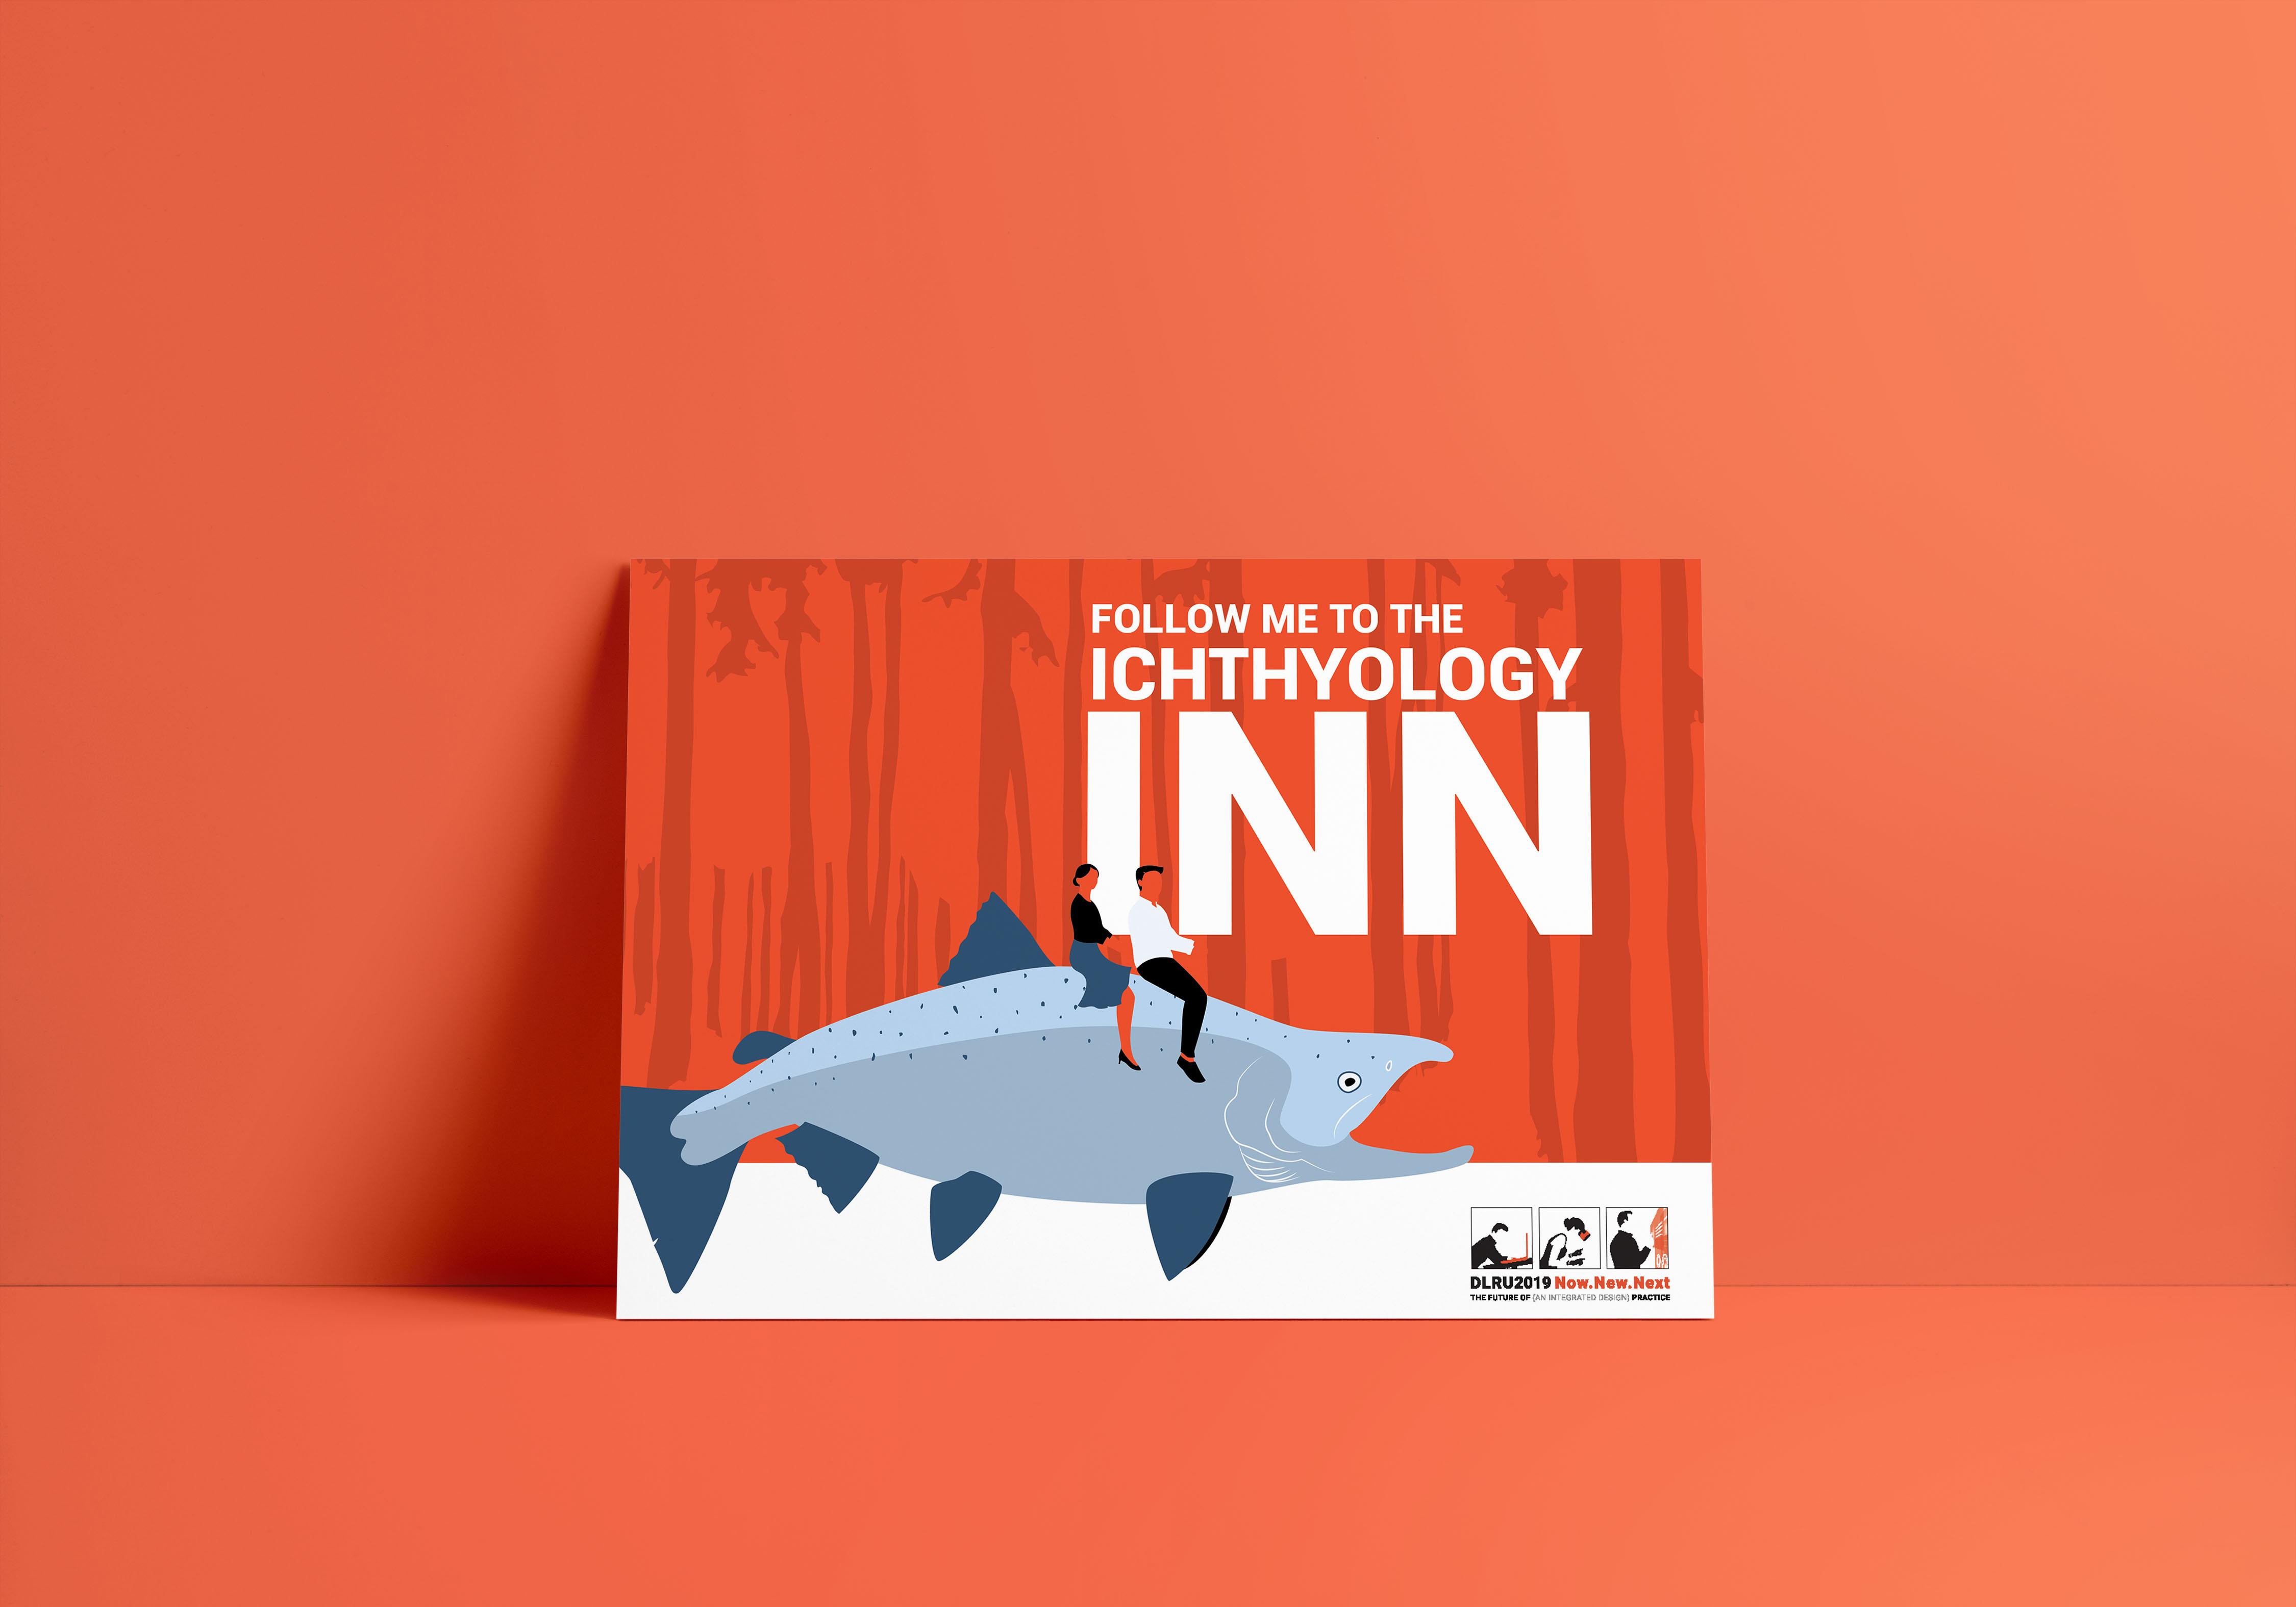 Ichthyology Inn